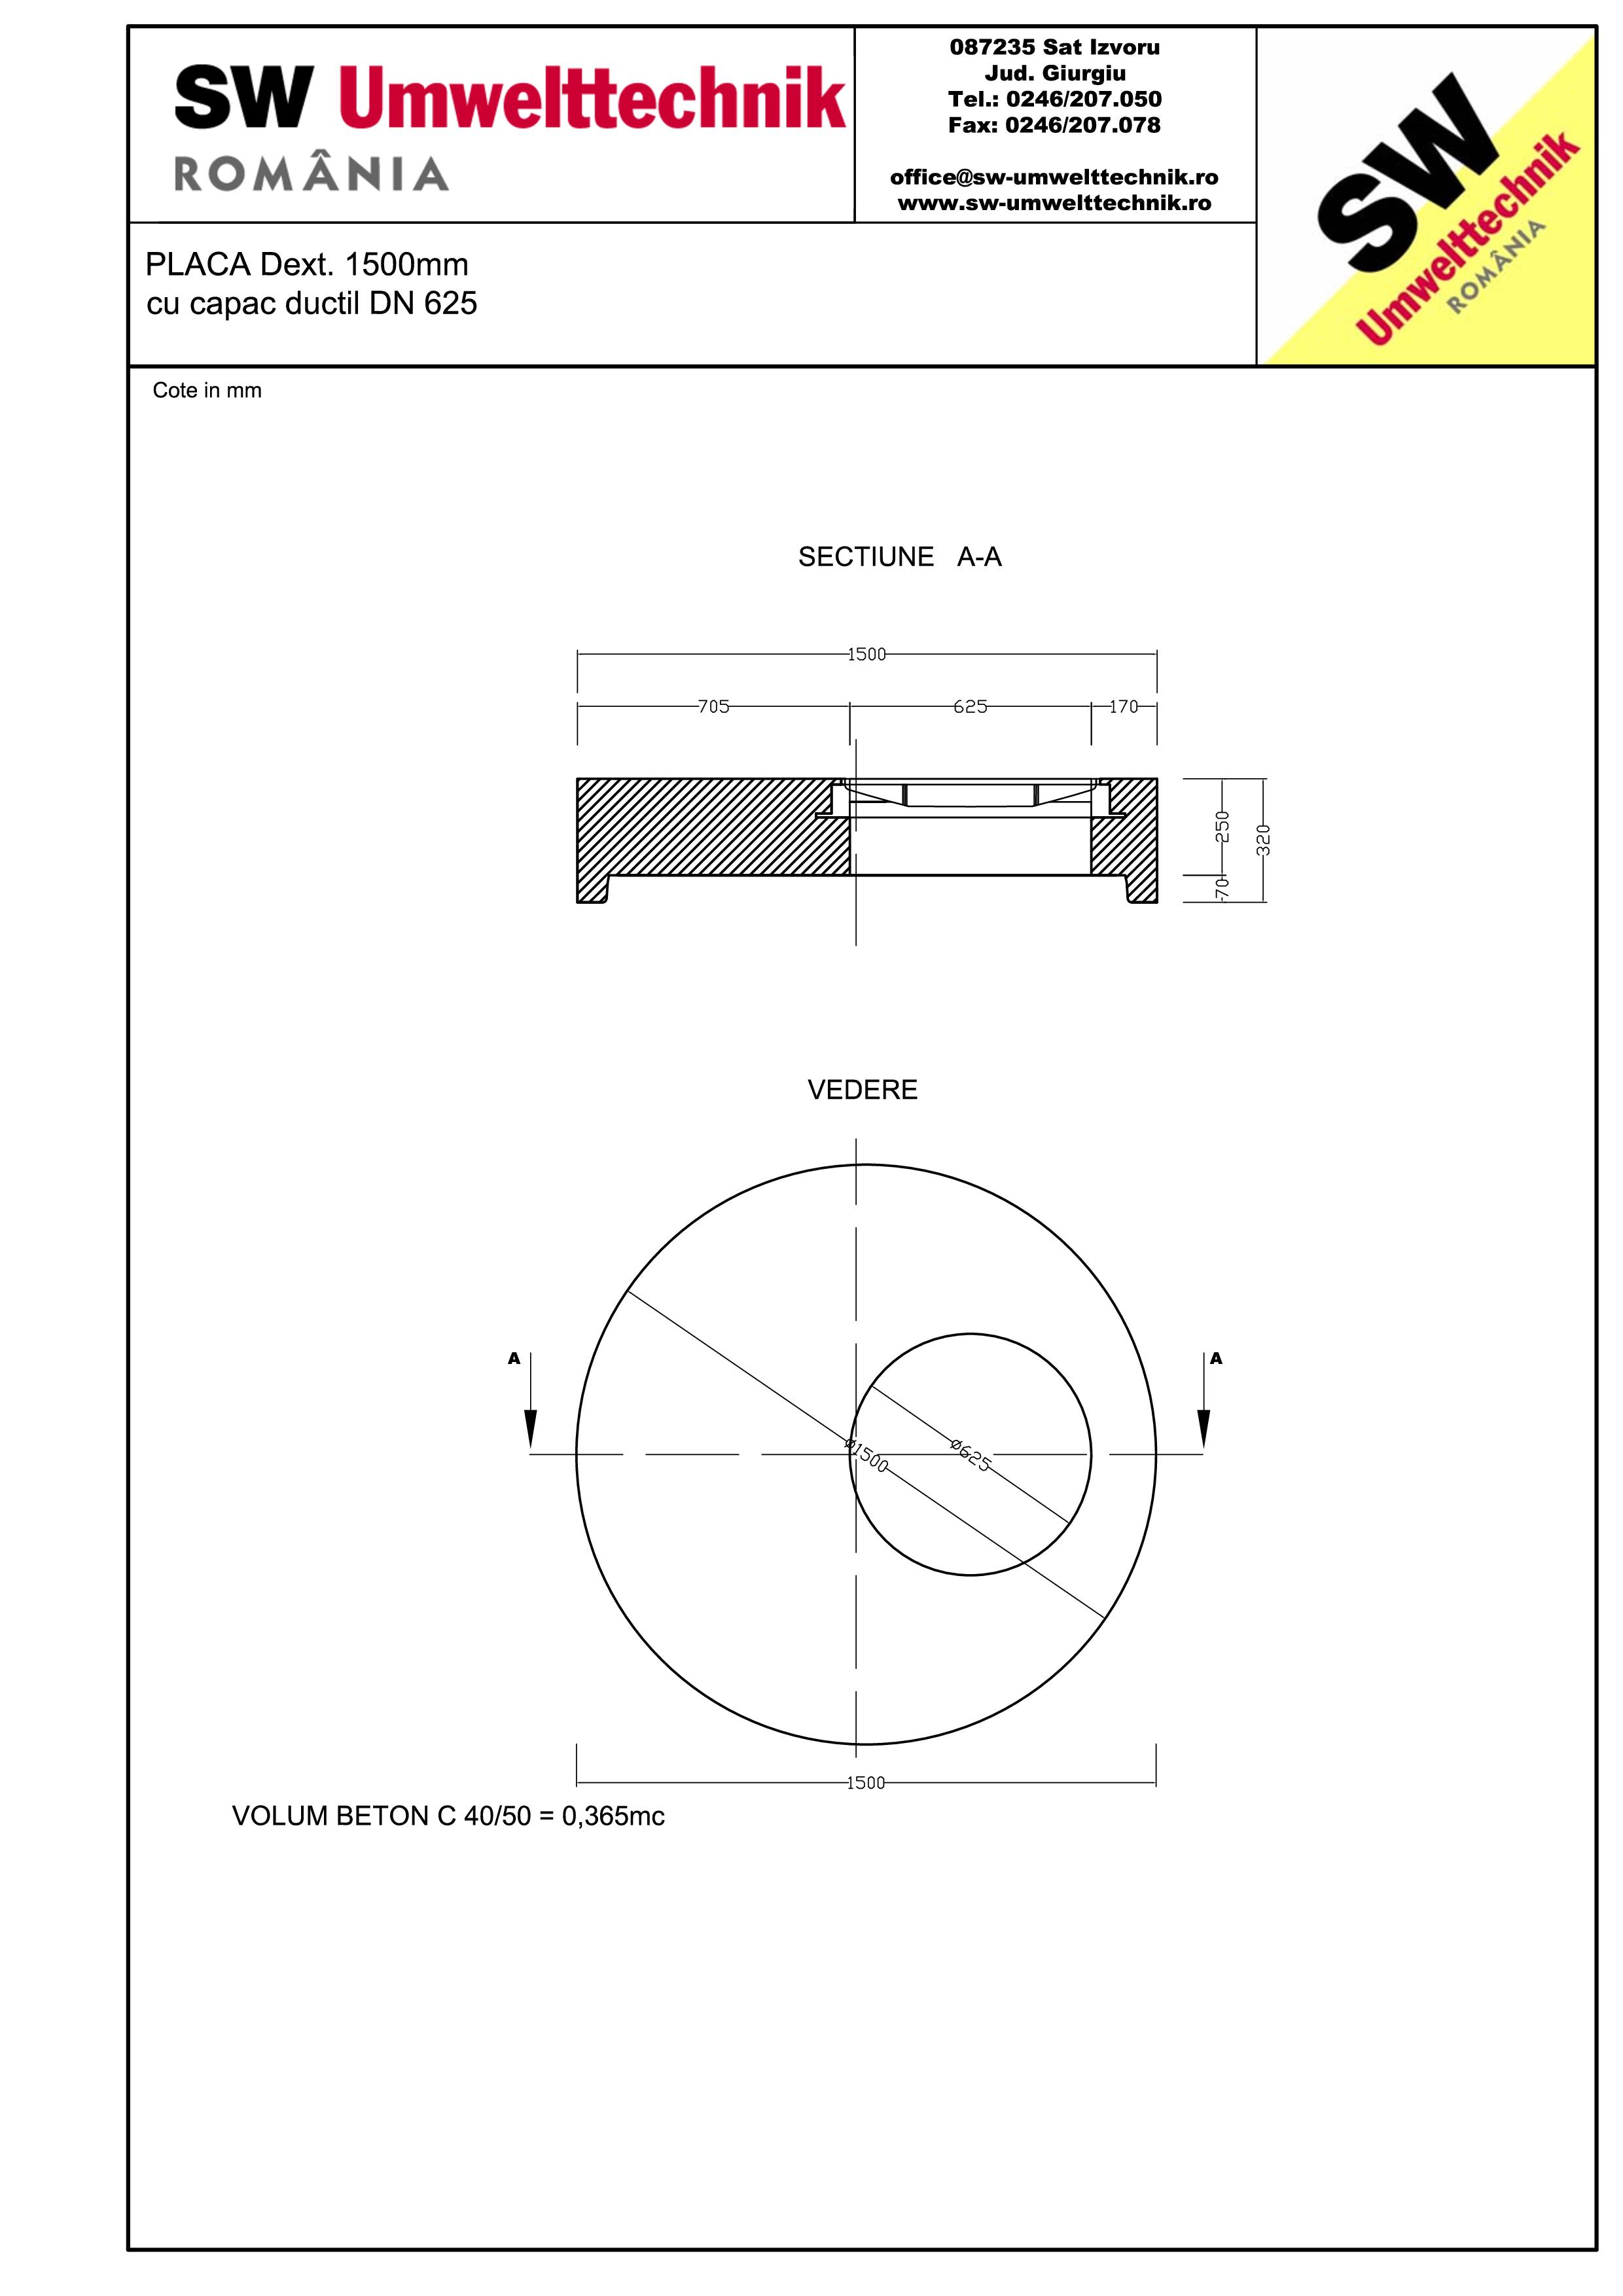 Pagina 1 - CAD-PDF Placa Dext.1500 H250 cu capac ductil DN625 SW UMWELTTECHNIK Detaliu de produs